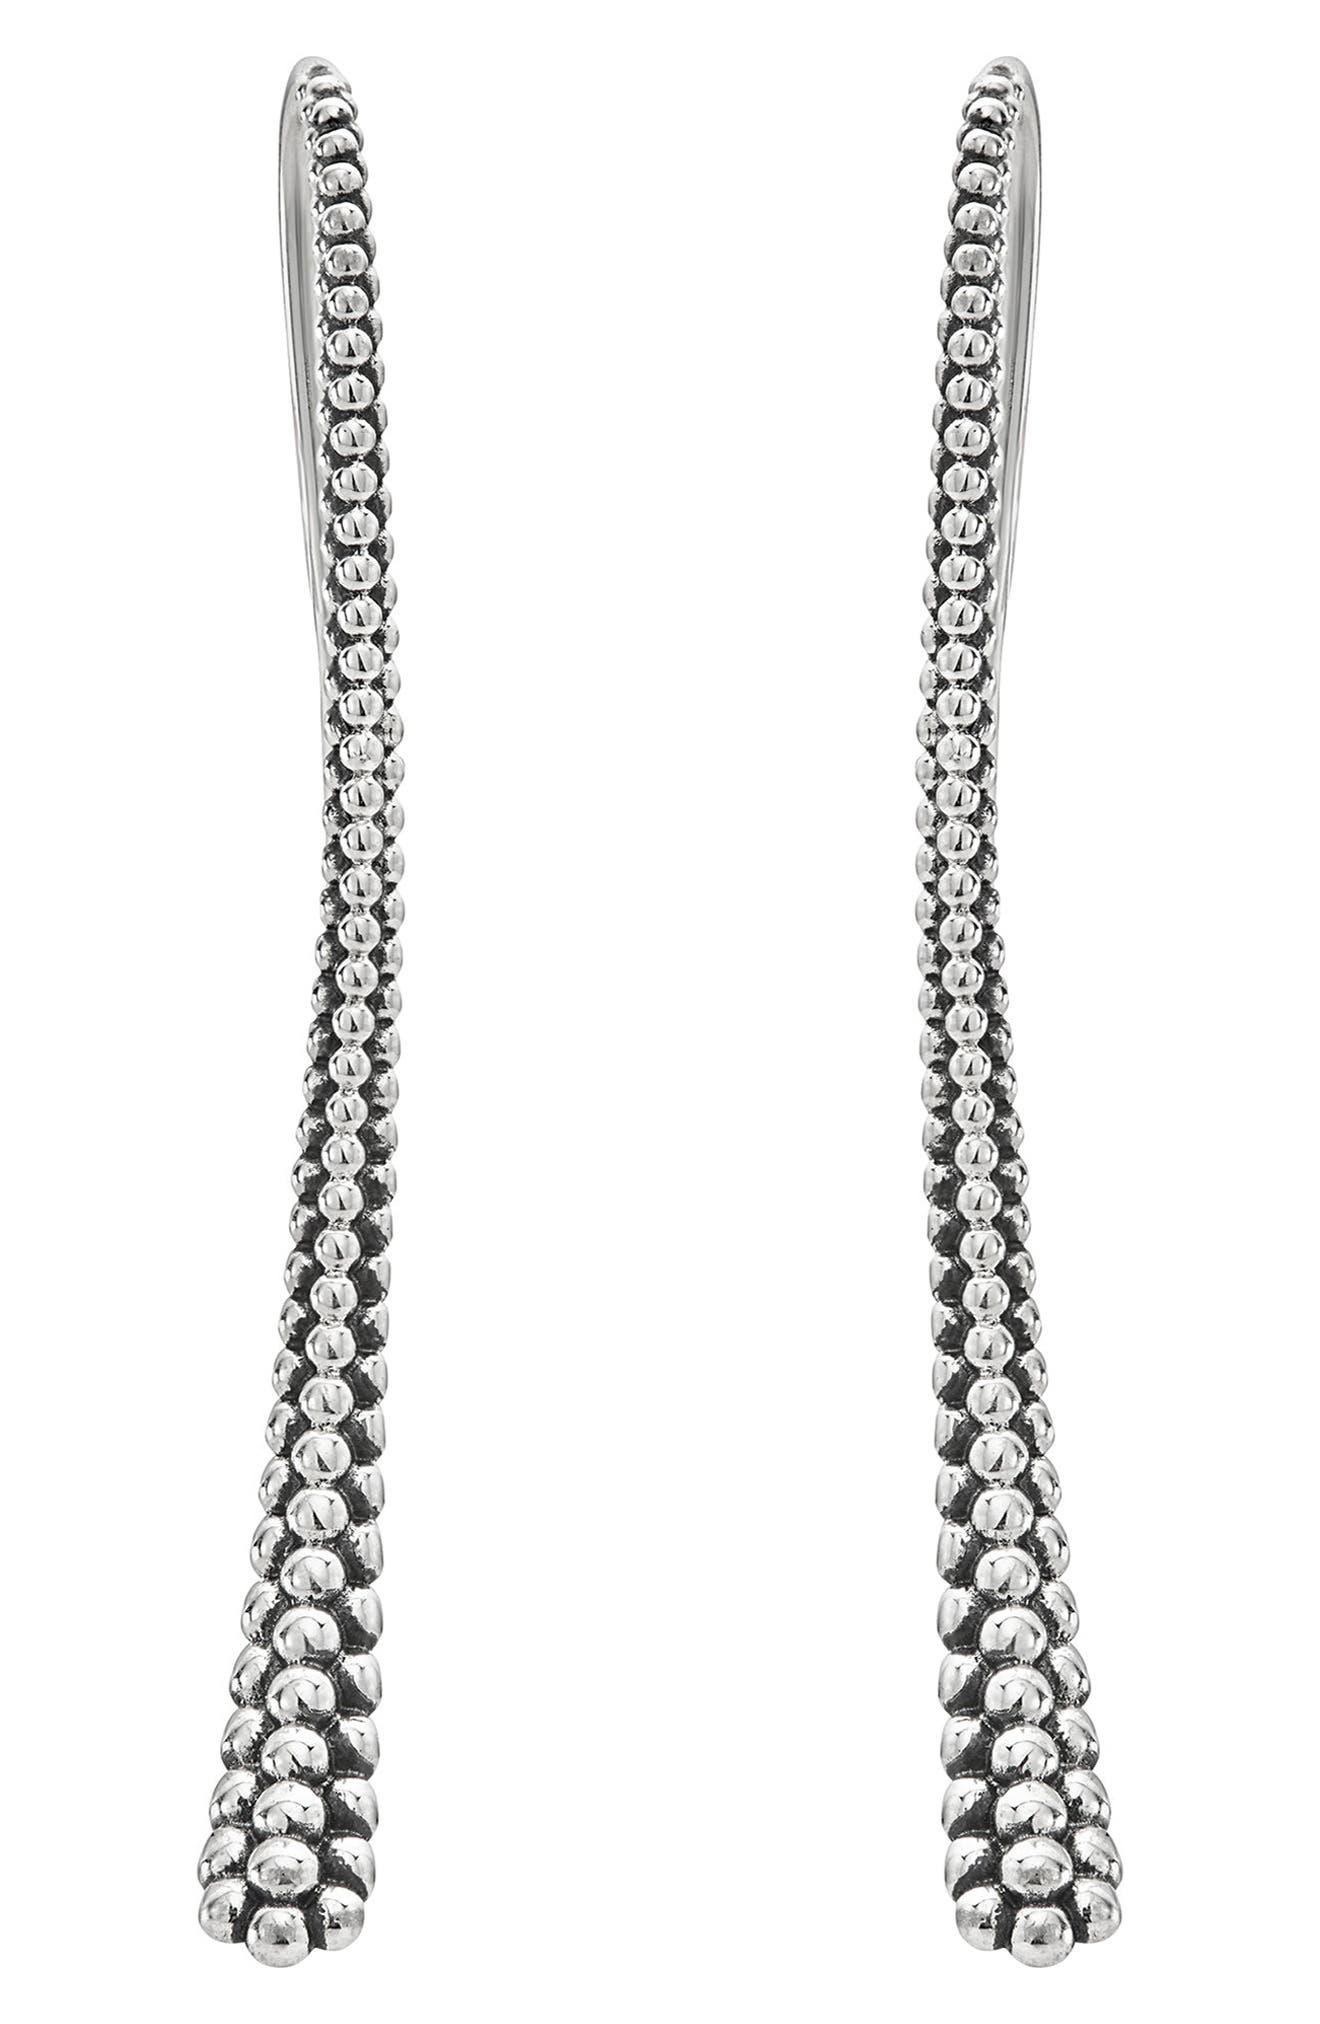 Caviar Linear Earrings,                             Alternate thumbnail 2, color,                             Silver